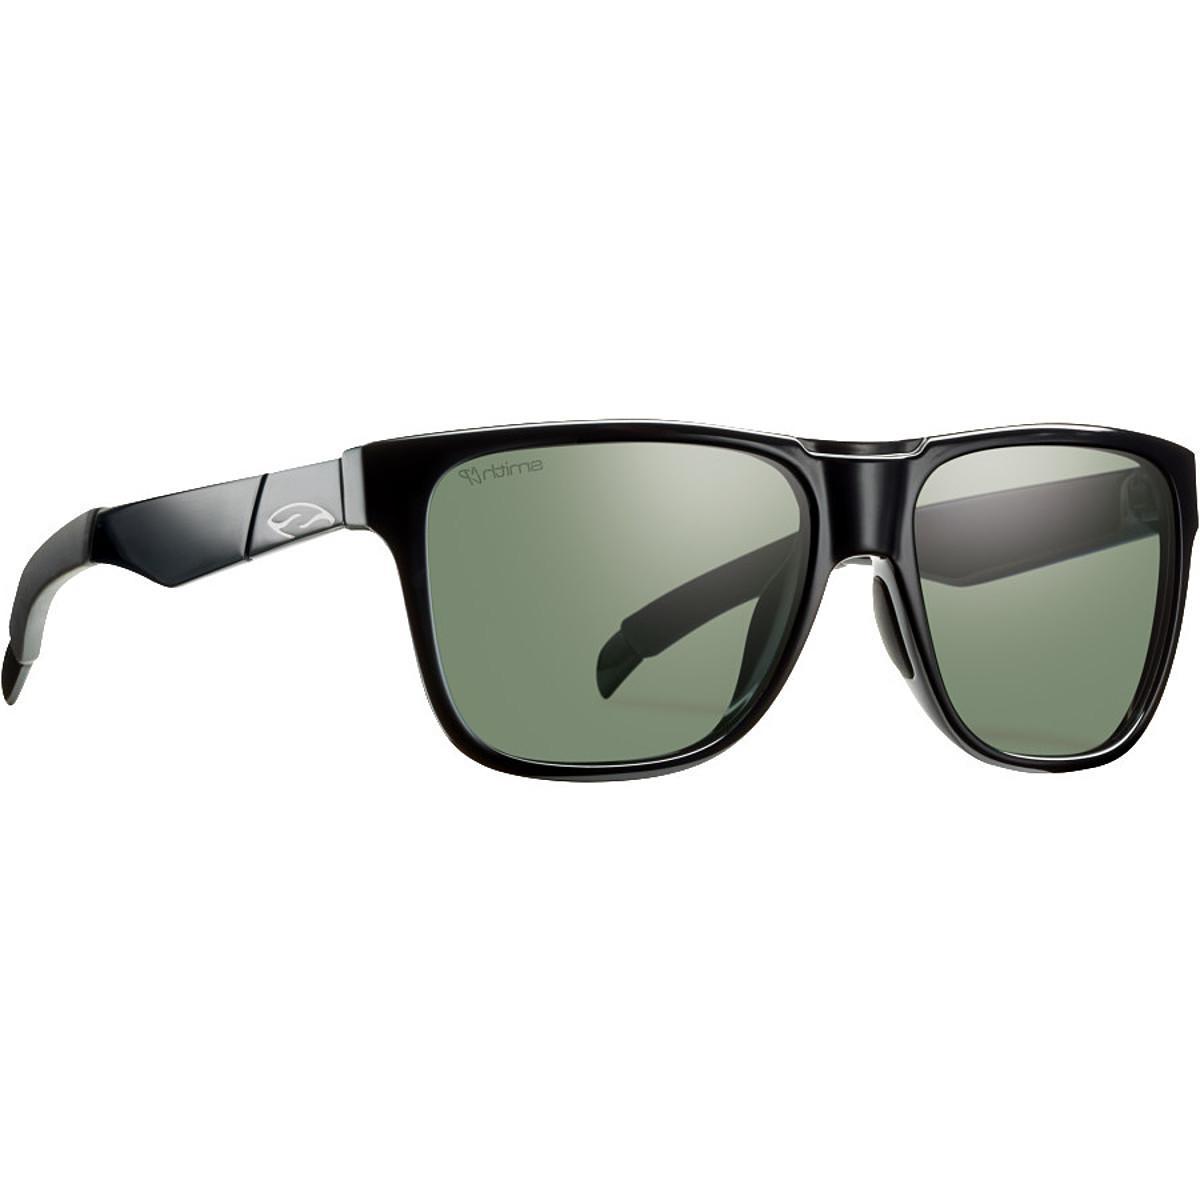 Smith Optics 2014/15 Lowdown Polarized Sunglasses